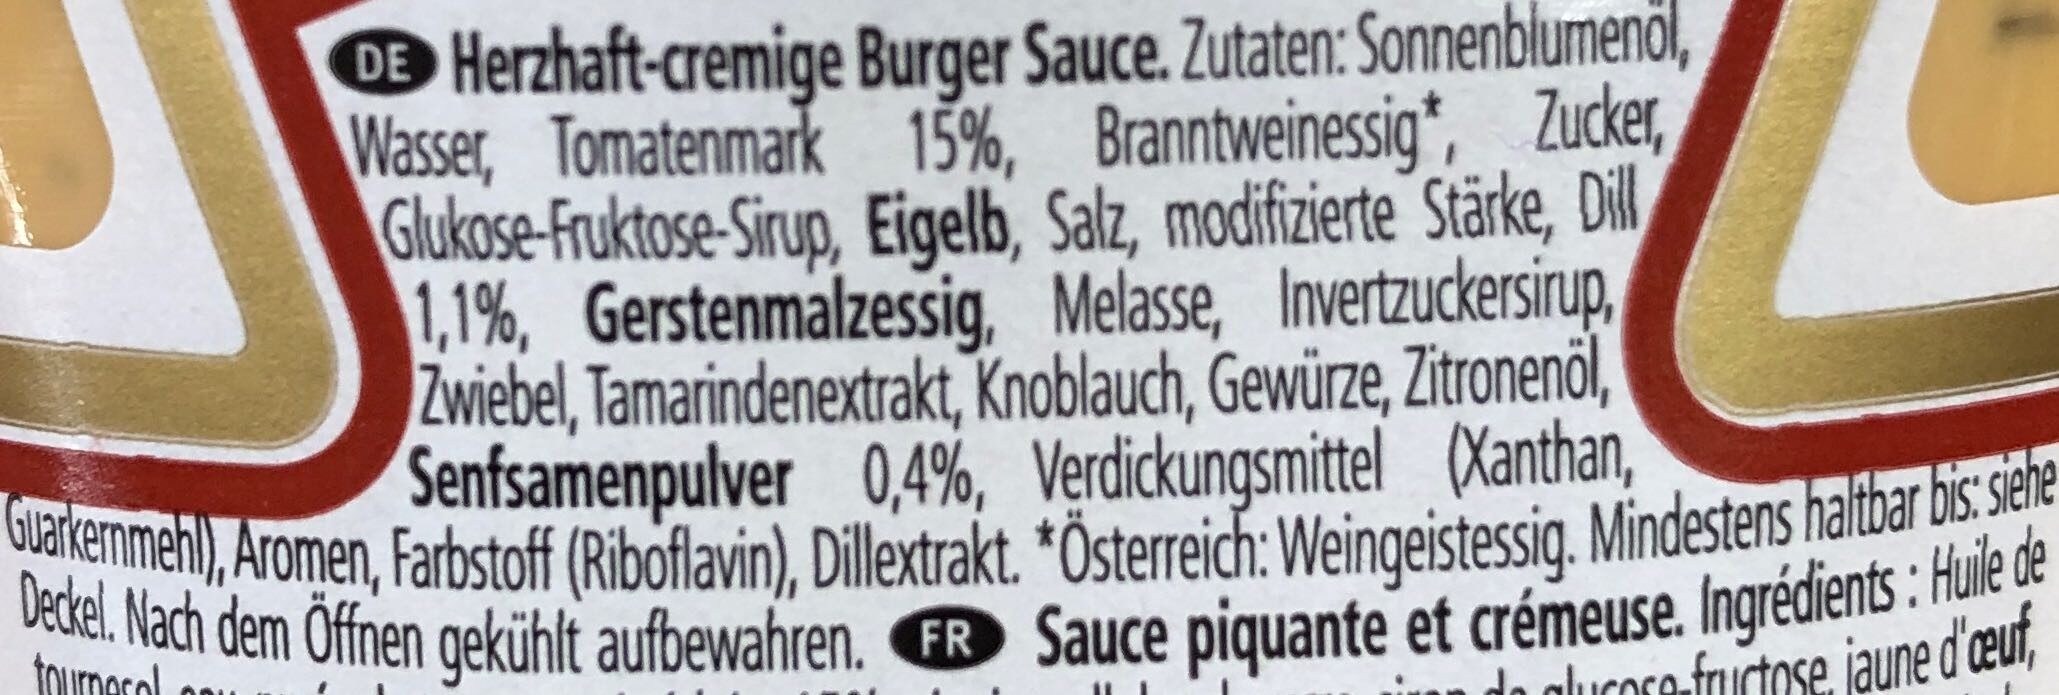 Burger Sauce - Ingredienti - de